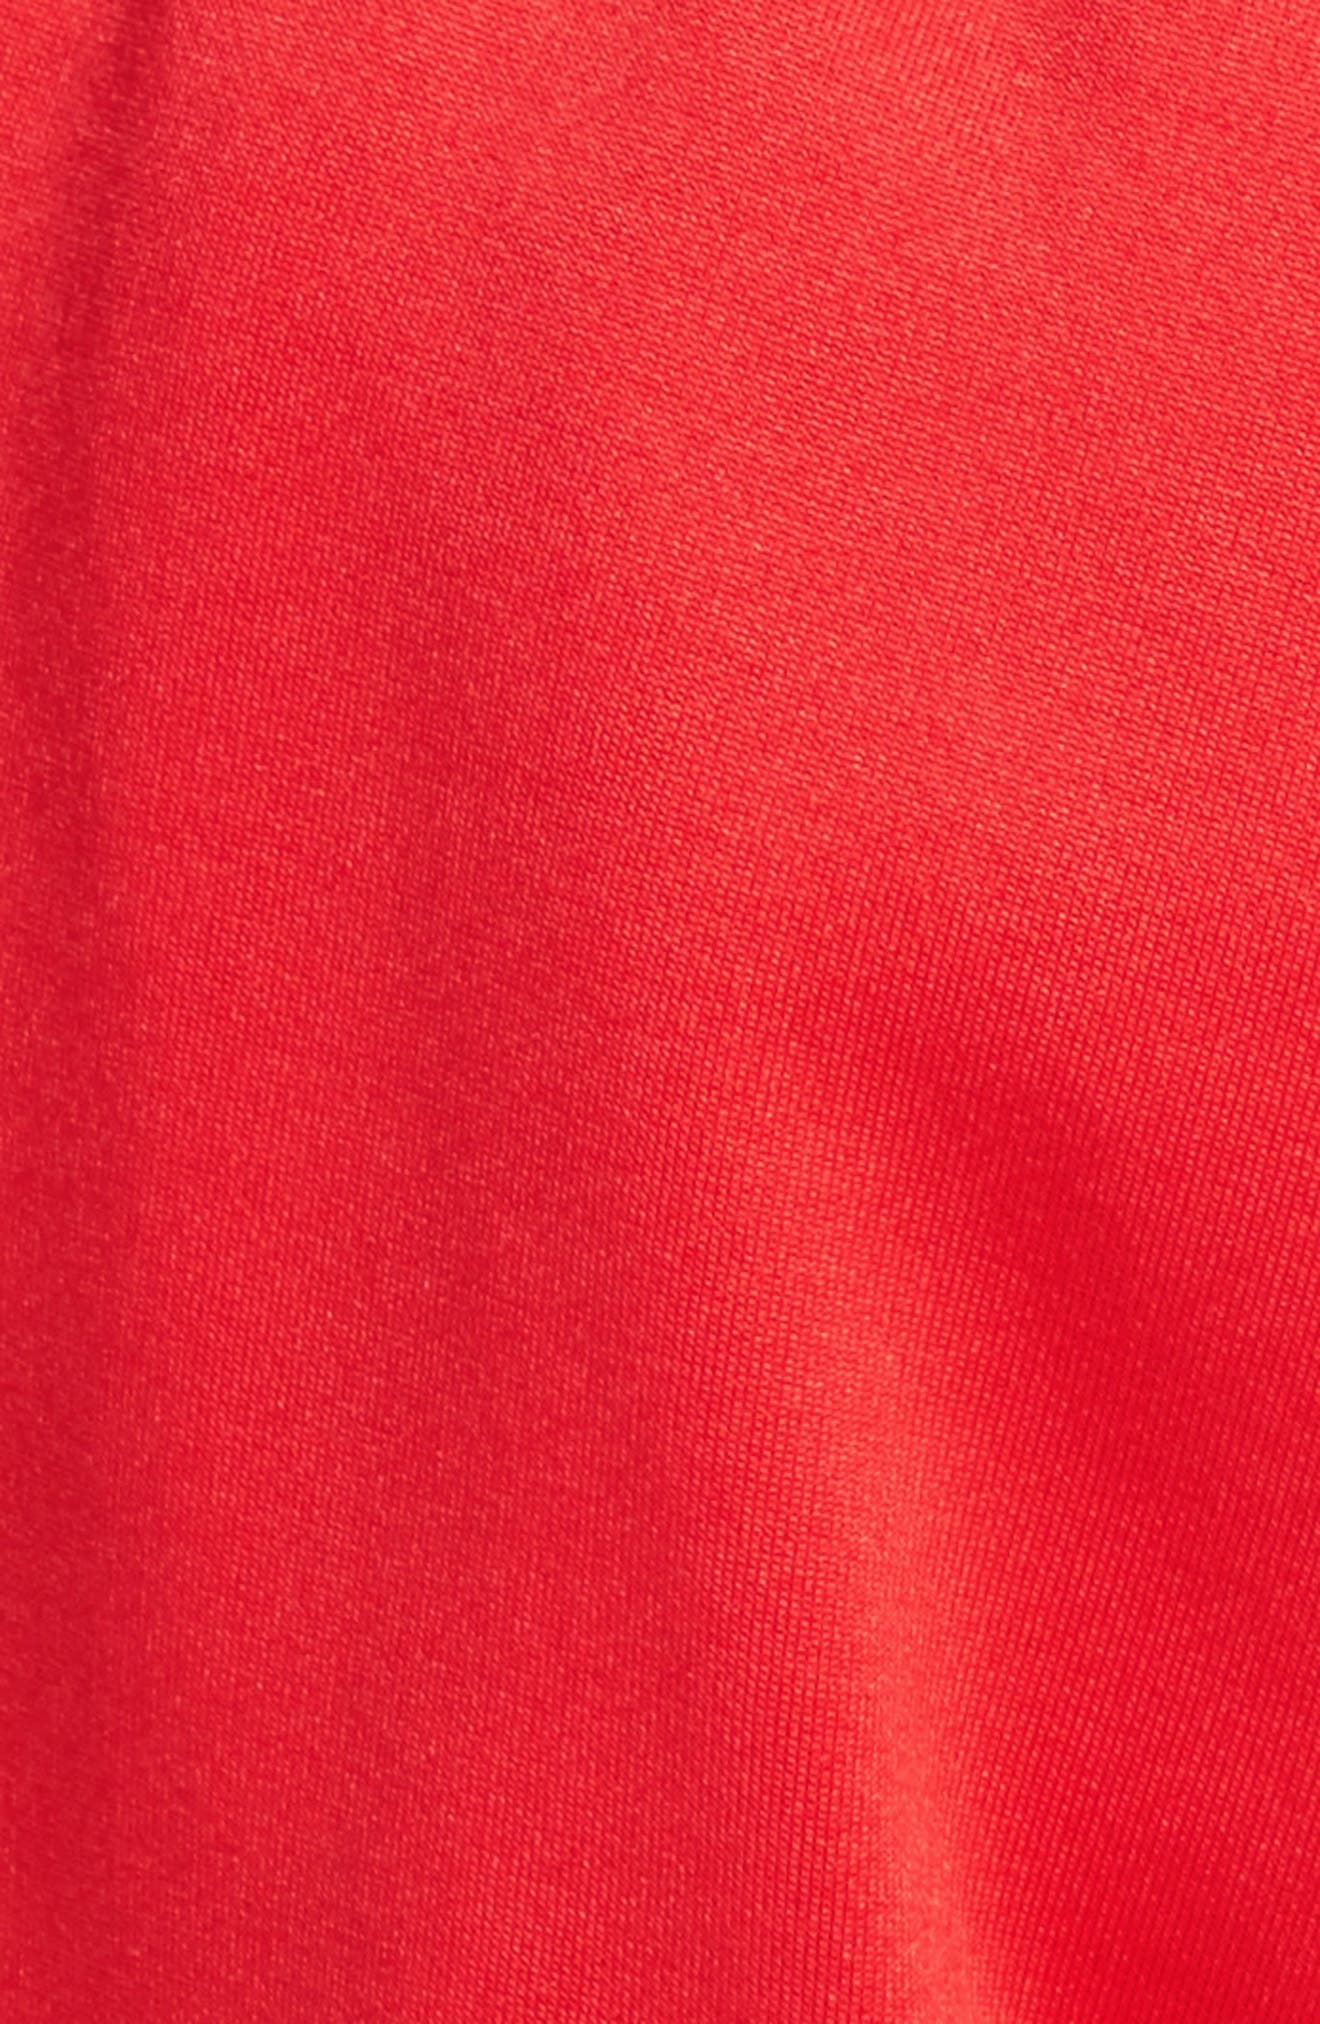 PSWL Jersey Track Pants,                             Alternate thumbnail 7, color,                             Poppy